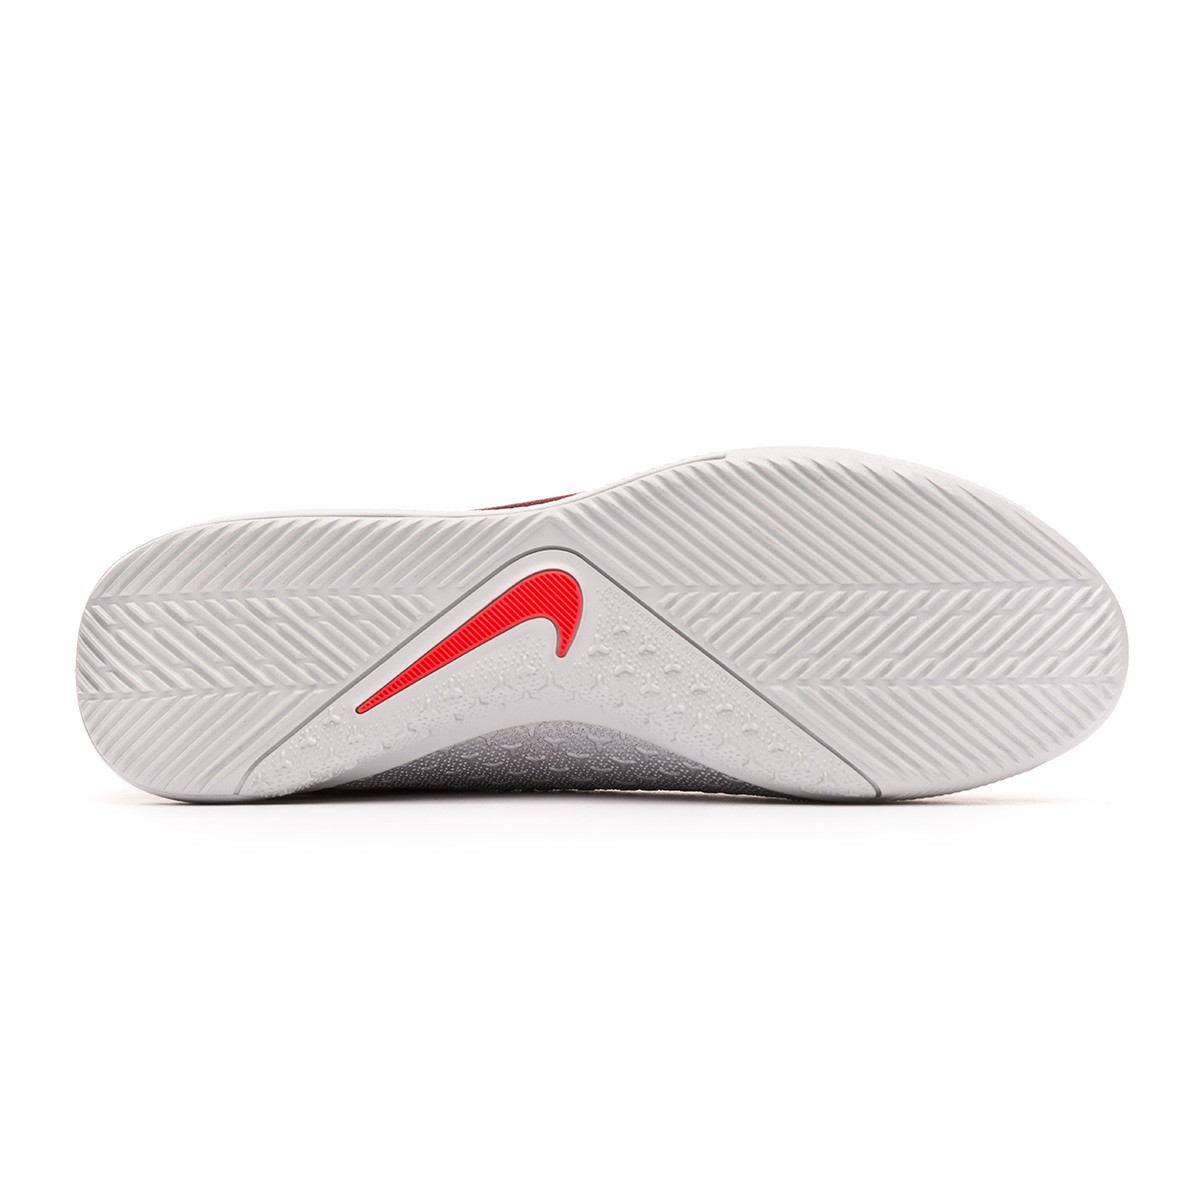 6e00014ccef Futsal Boot Nike Phantom Vision Academy DF IC Team red-Metallic dark  grey-Bright crimson - Football store Fútbol Emotion